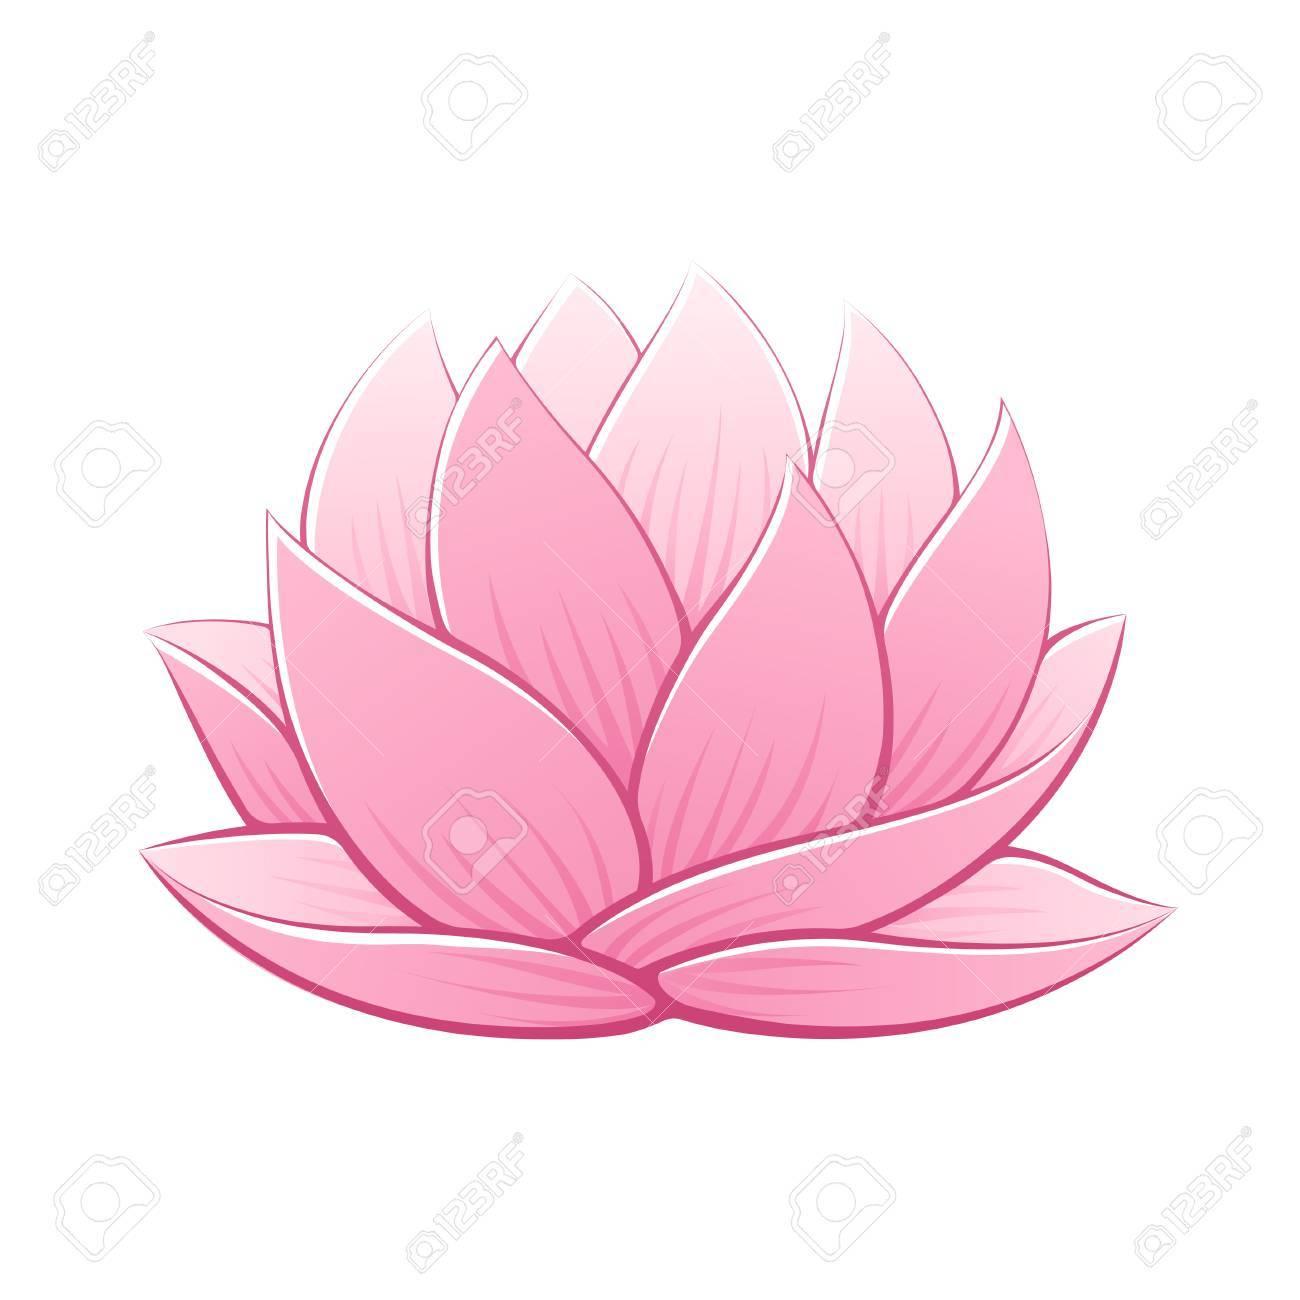 Pink Lotus Flower Vector Illustration Beautiful Realistic Waterlily